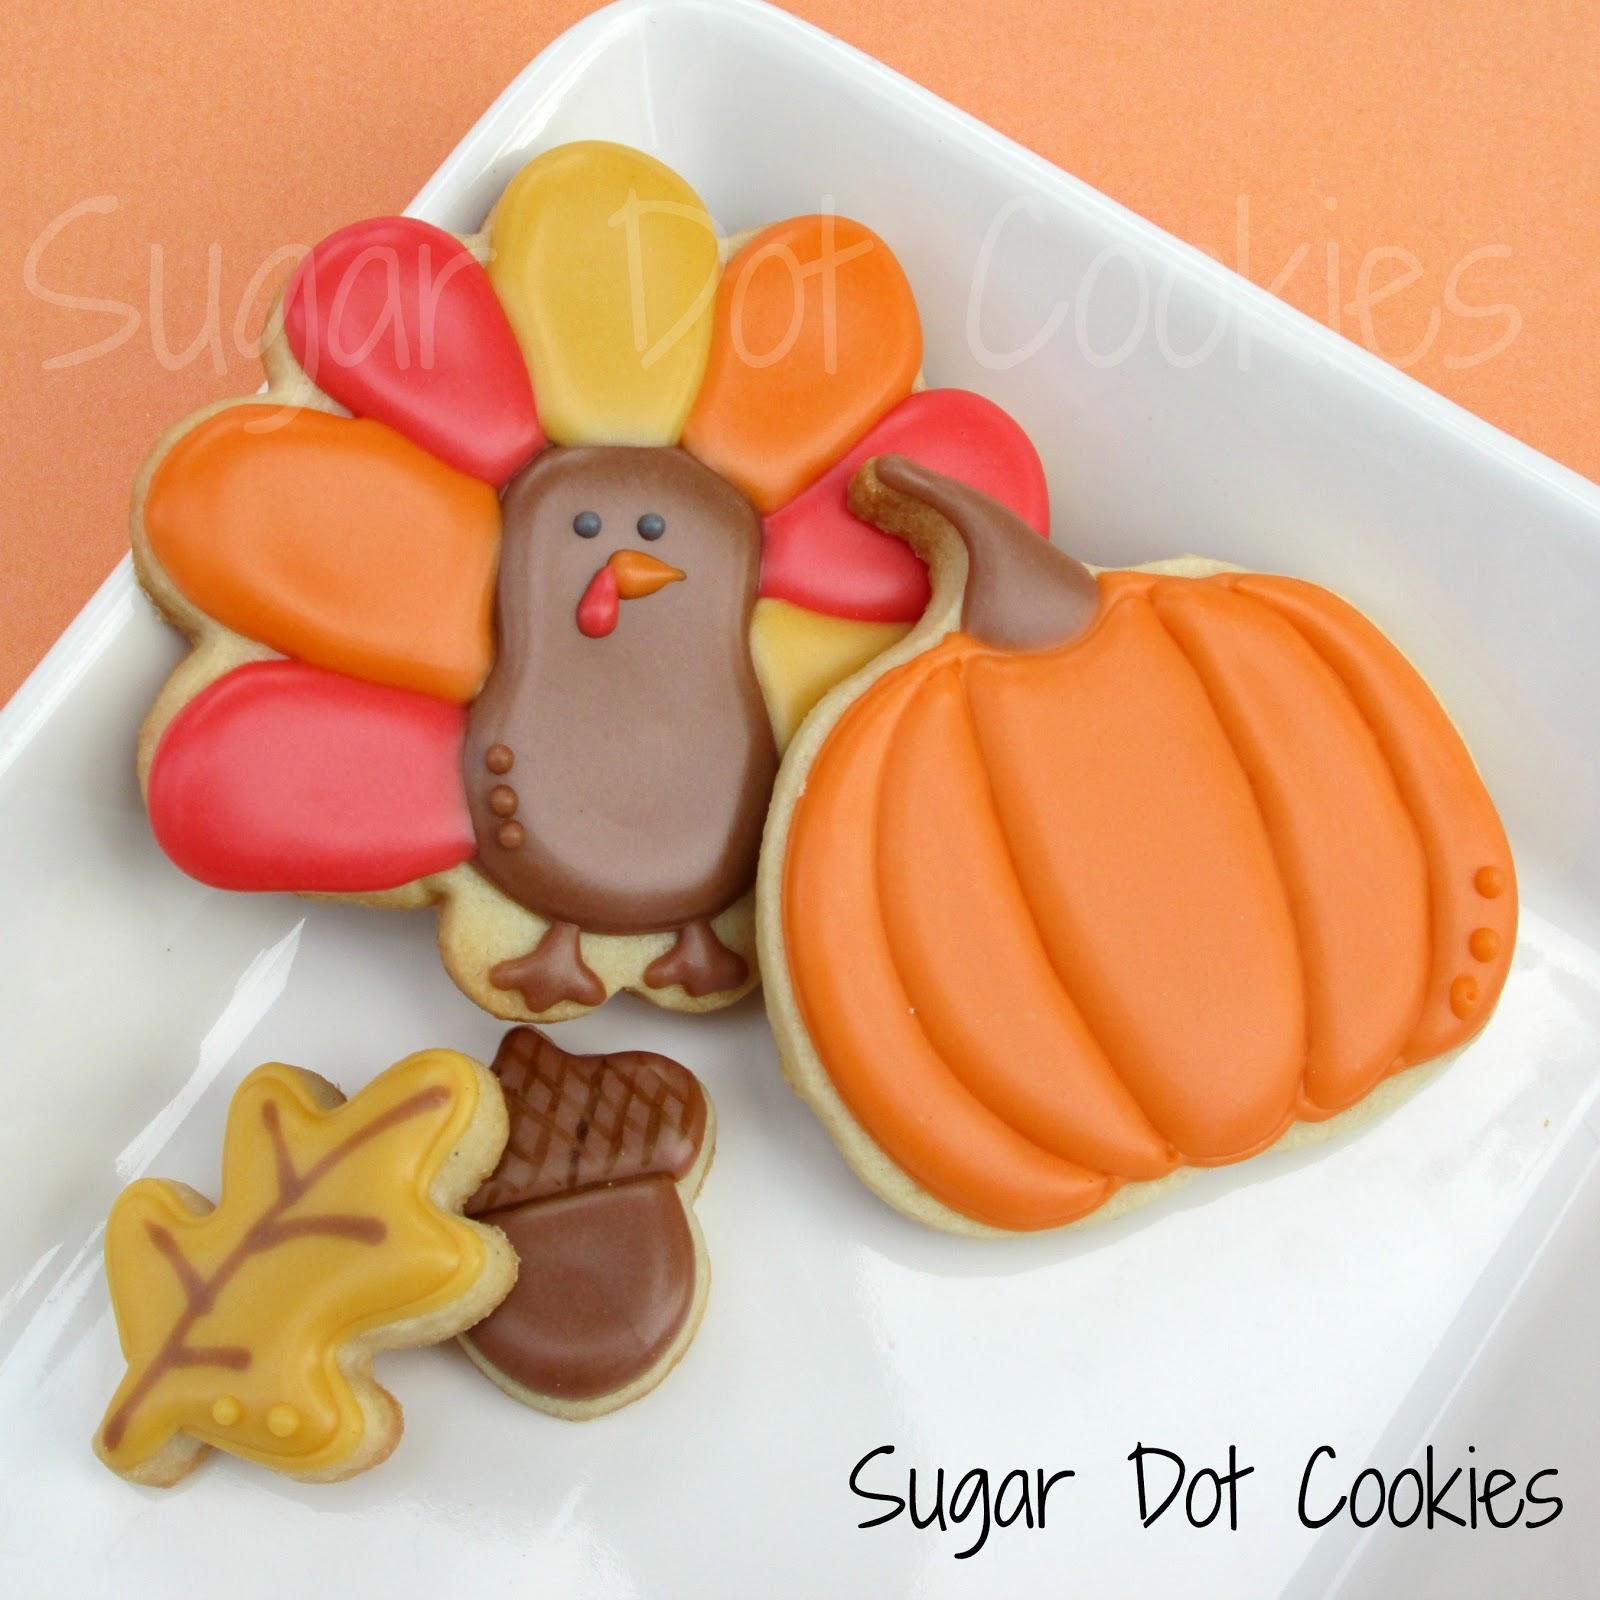 Sugar Dot Cookies: Thanksgiving Sugar Cookies with Royal Icing Glaze